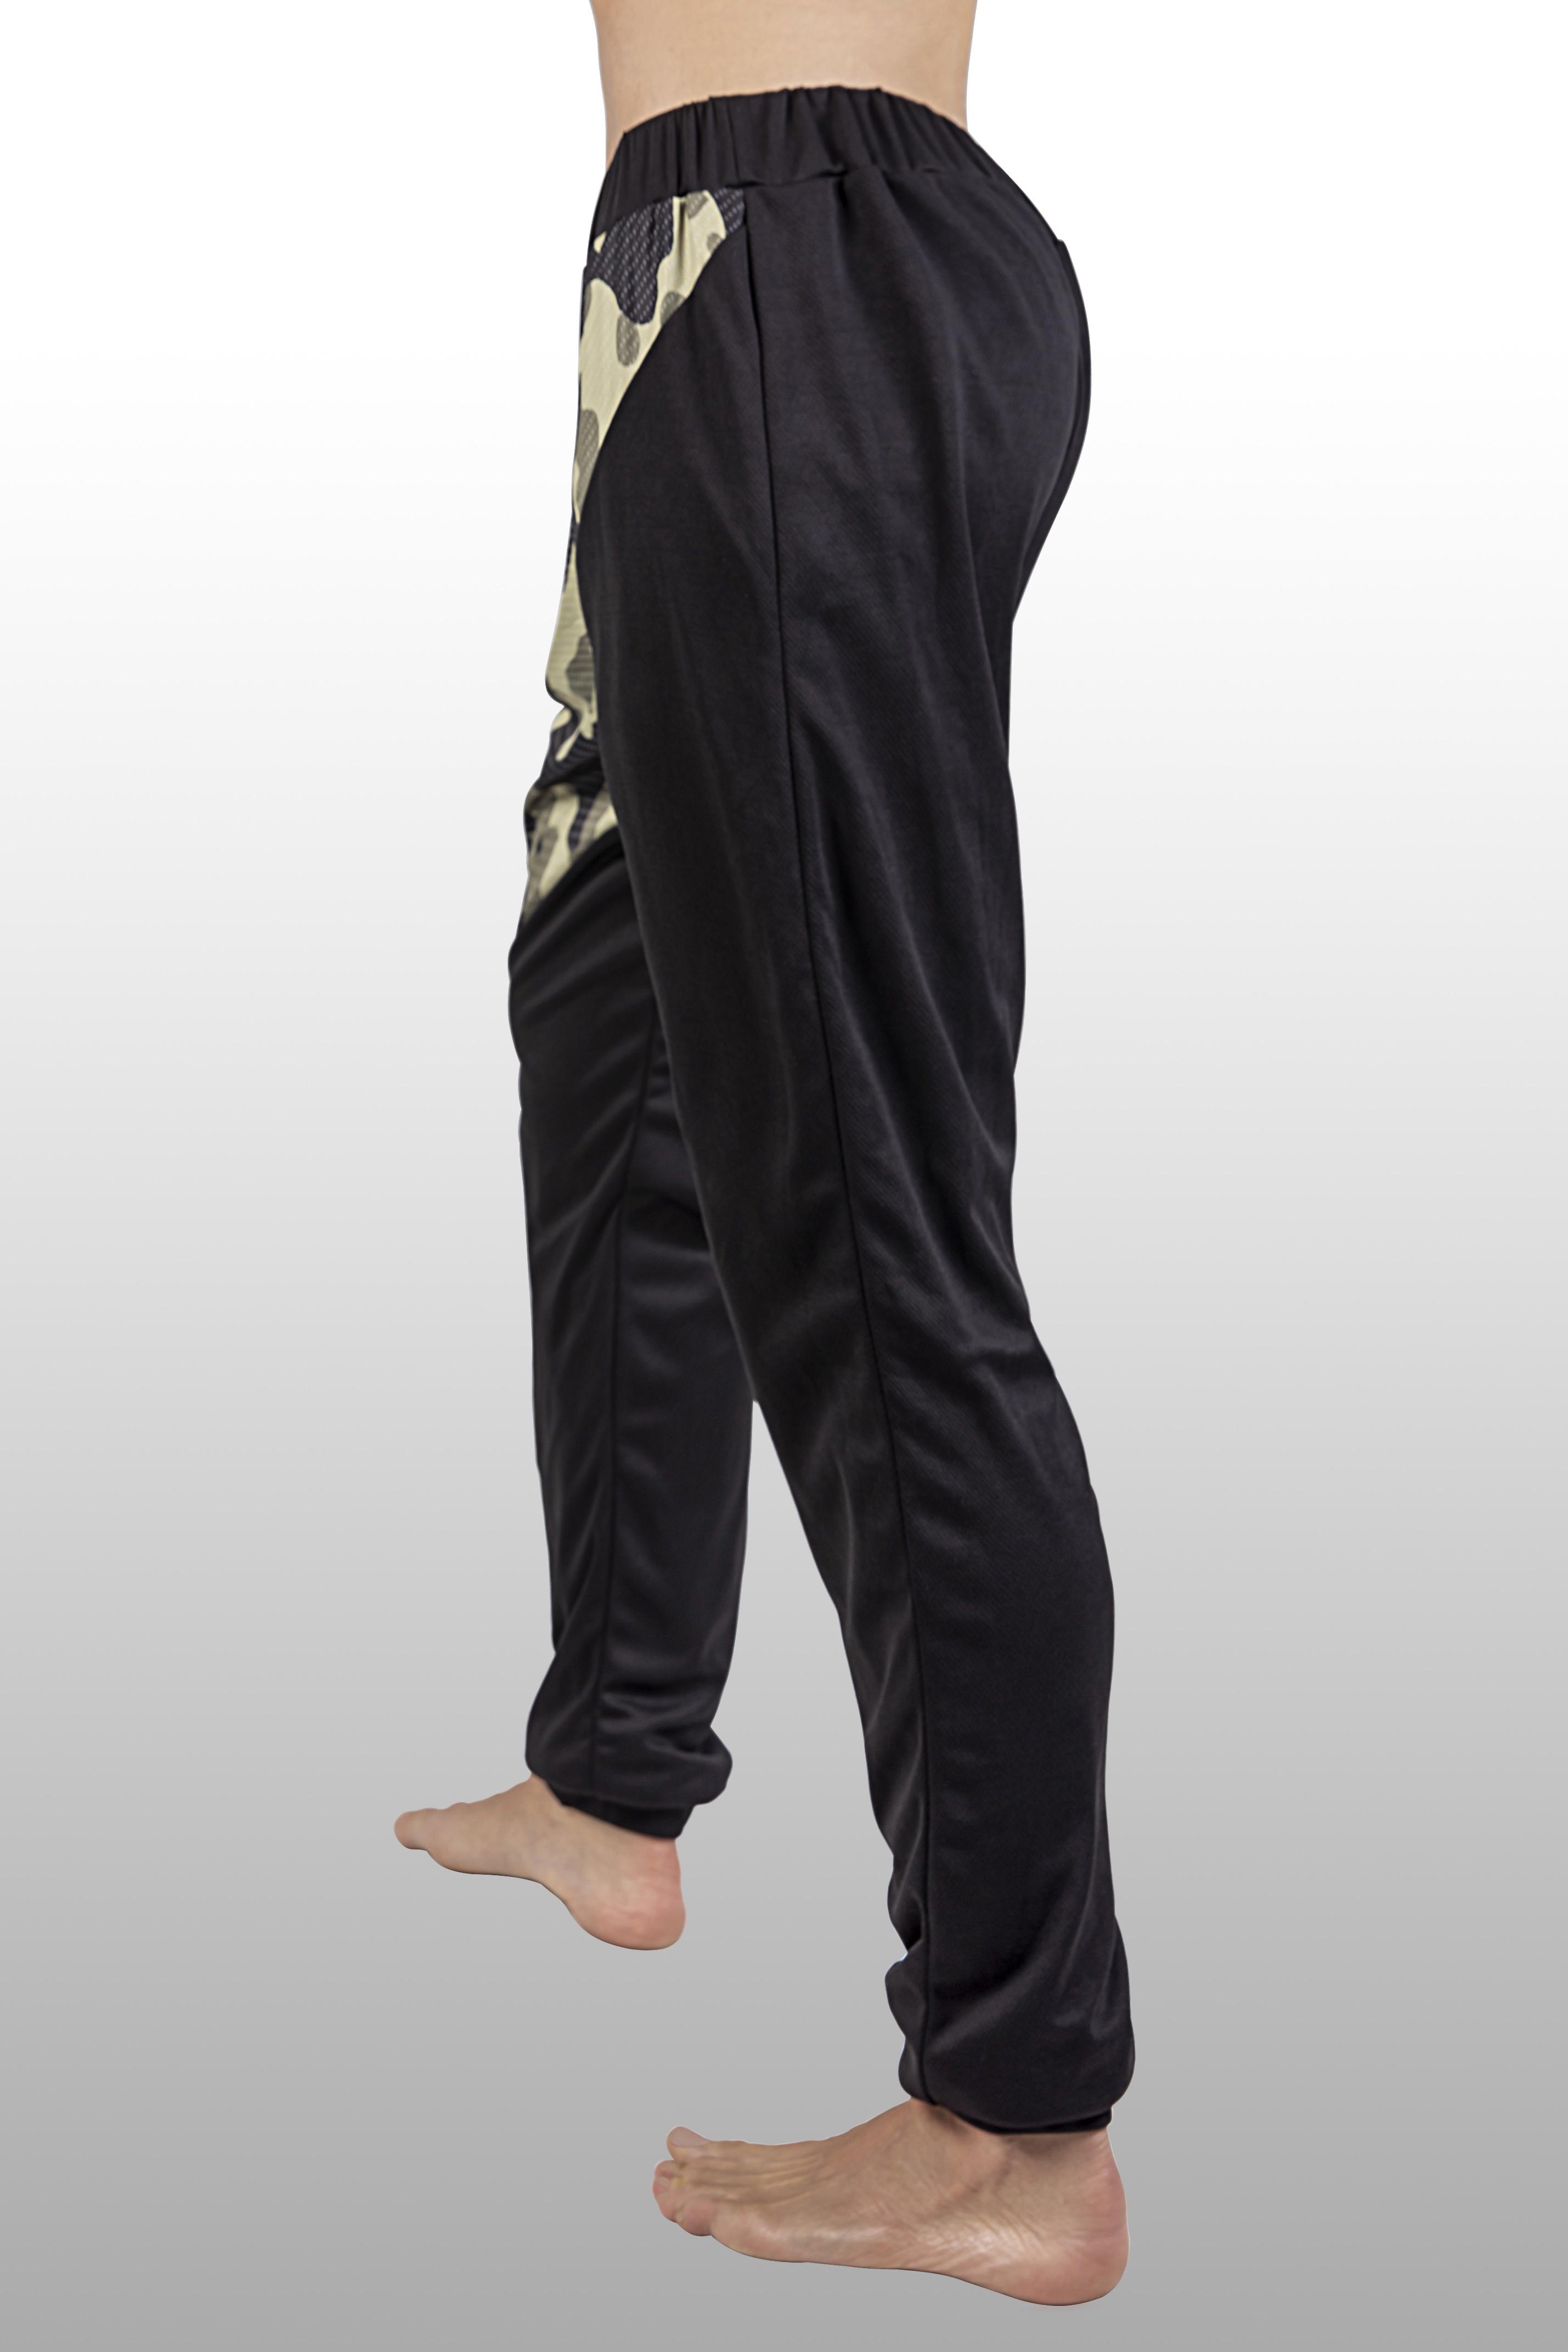 2xME unisex pants moro